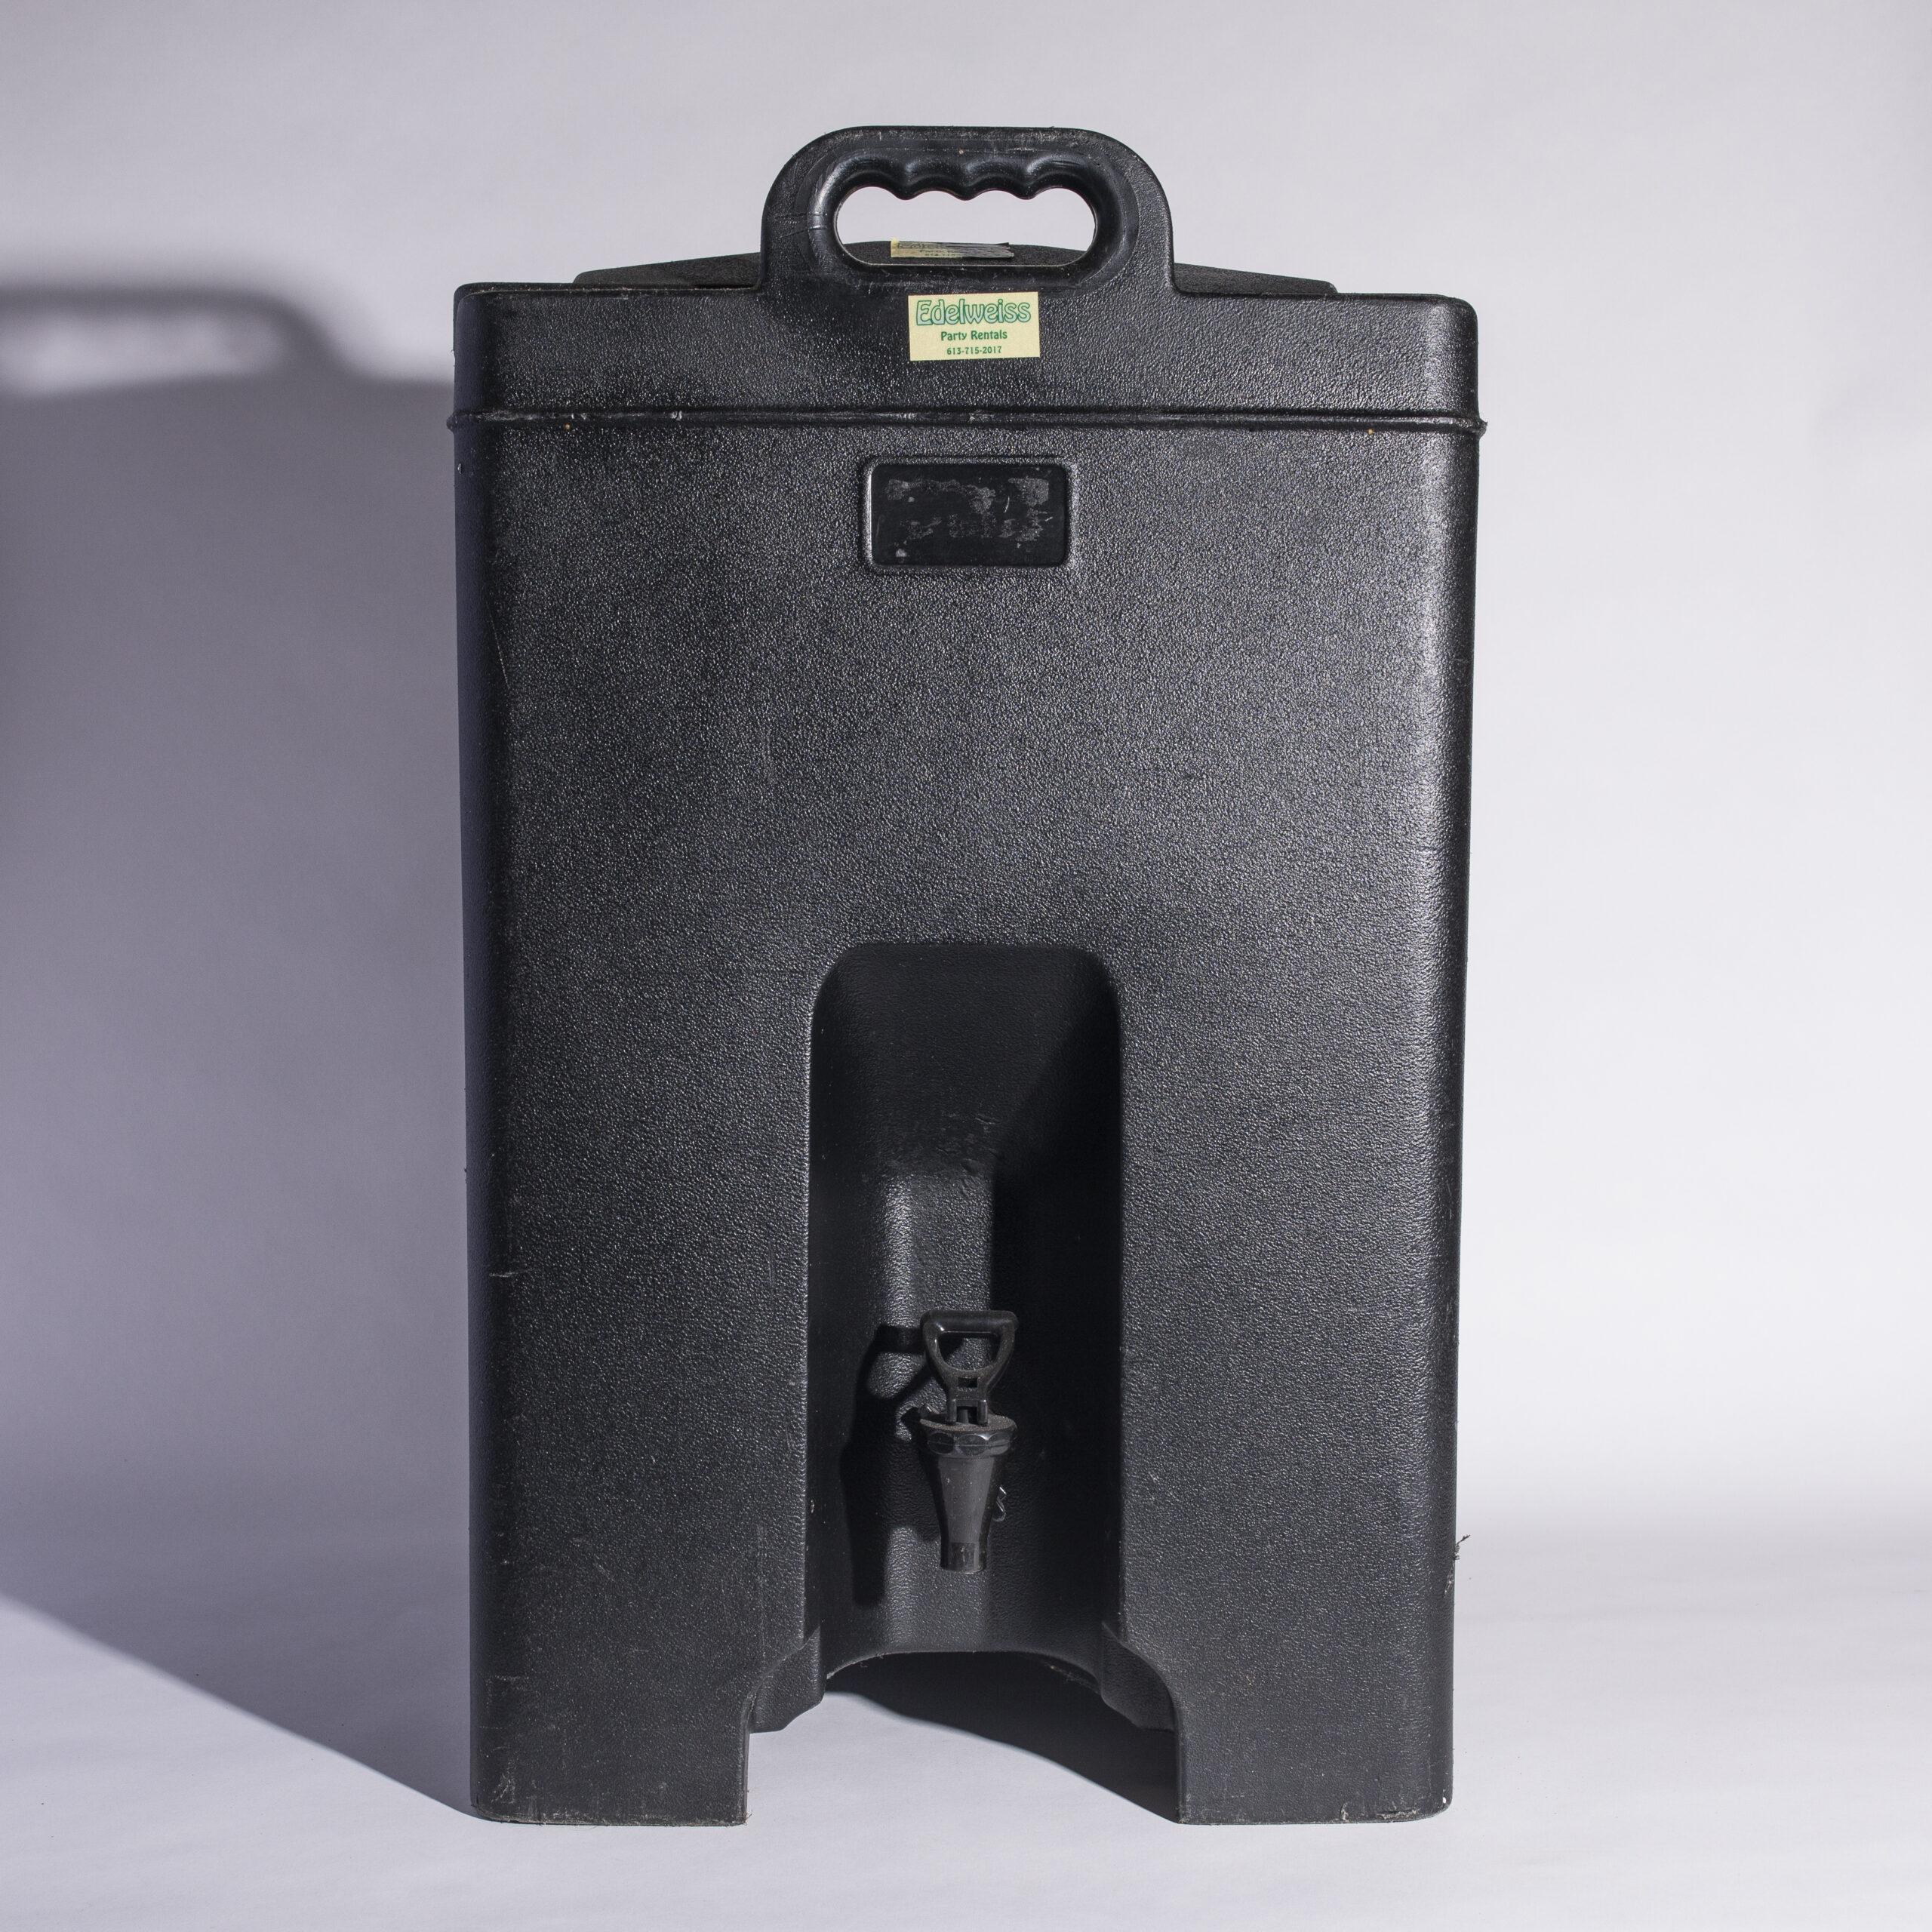 Coffee dispenser (160 cups, plastic)